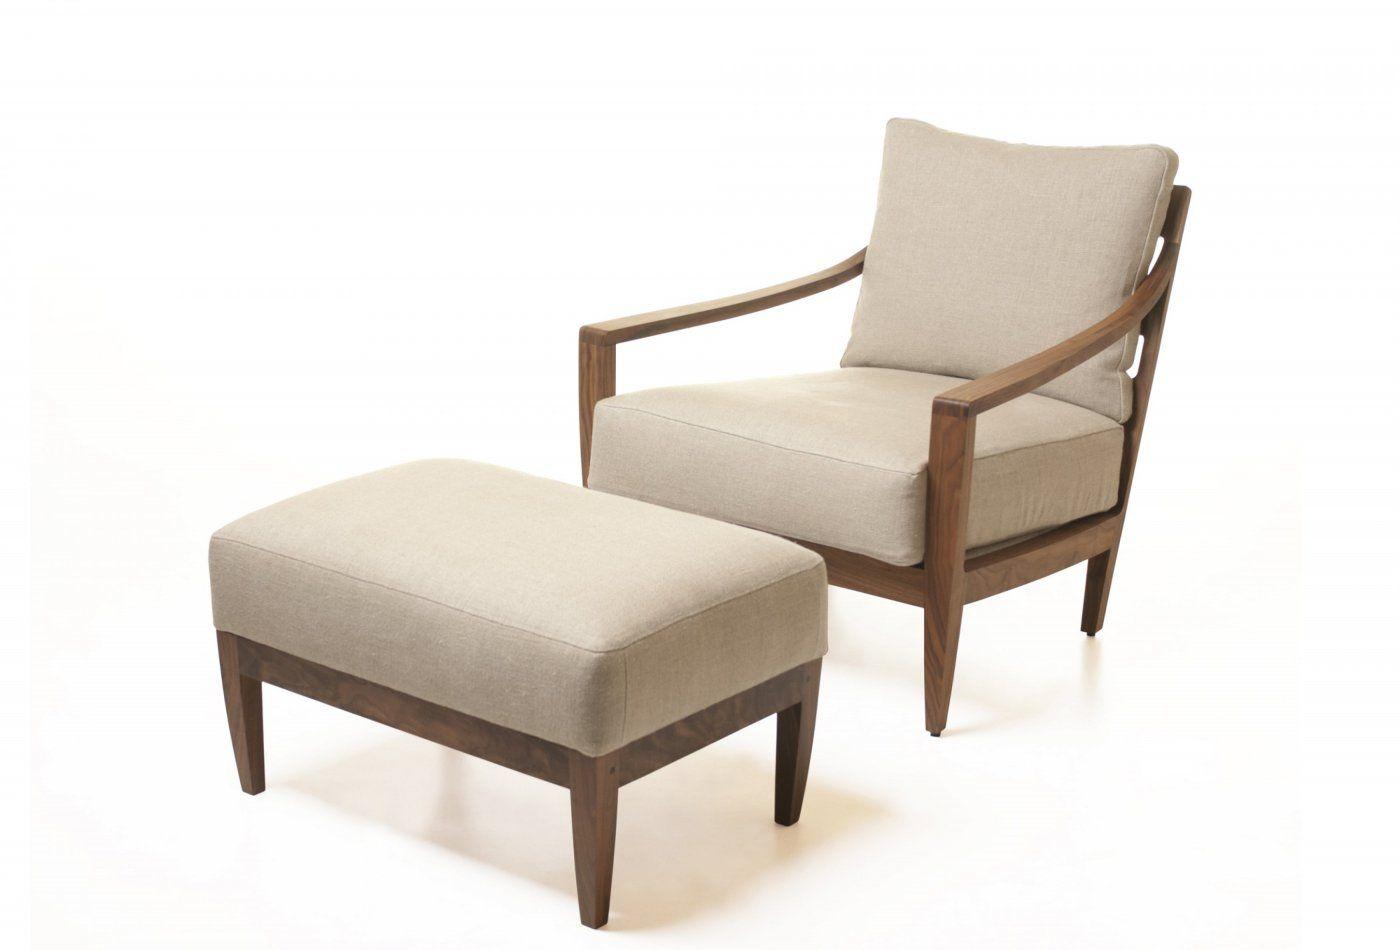 De la espada matthew hilton 340 low lounge chair product - Hilton furniture living room sets ...